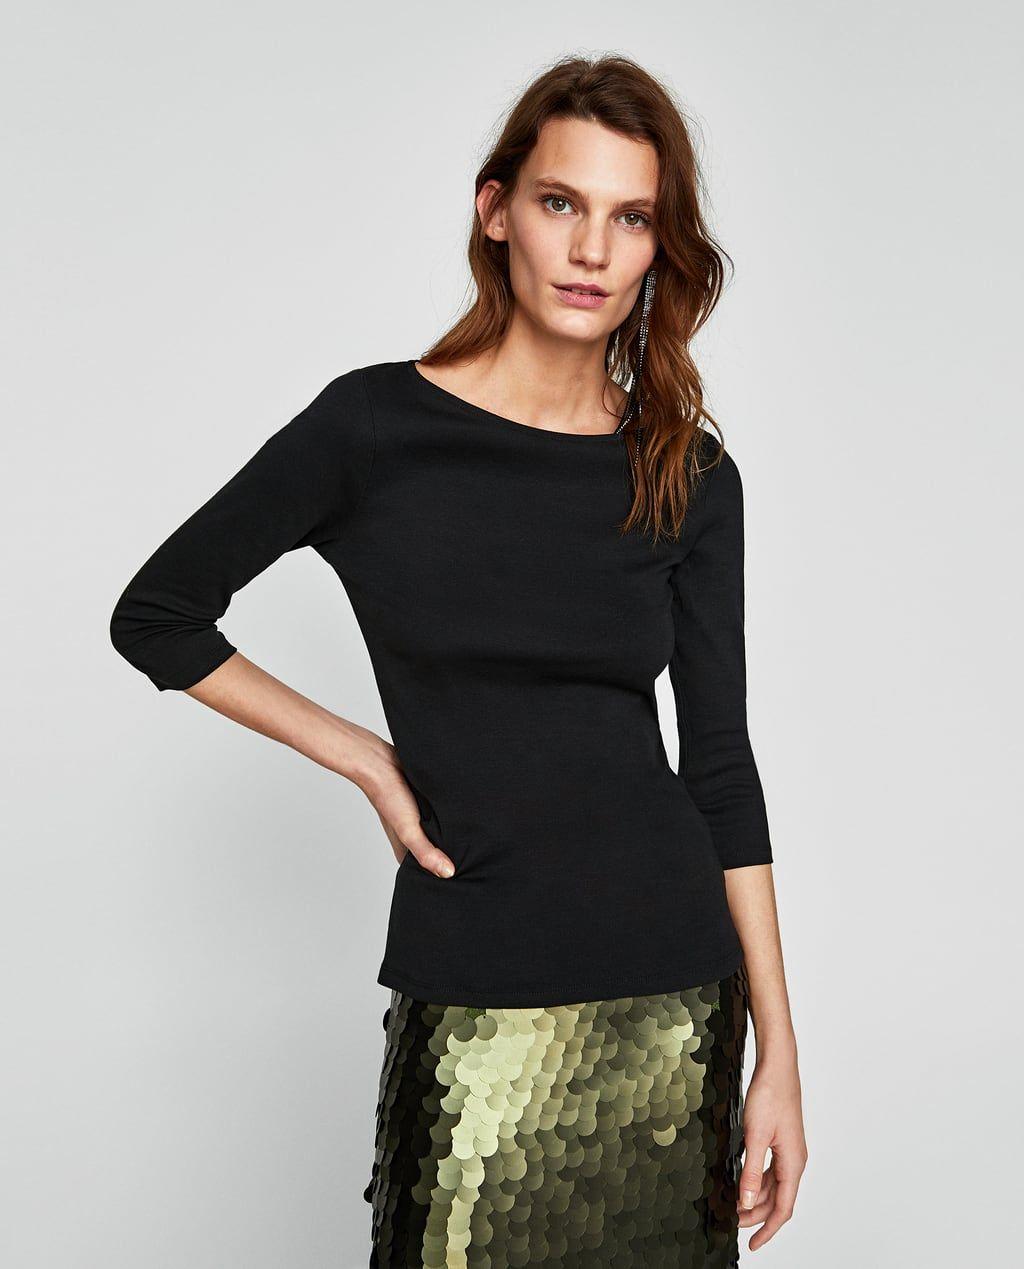 Tshirt with three quarter length sleevesnew inwoman zara united